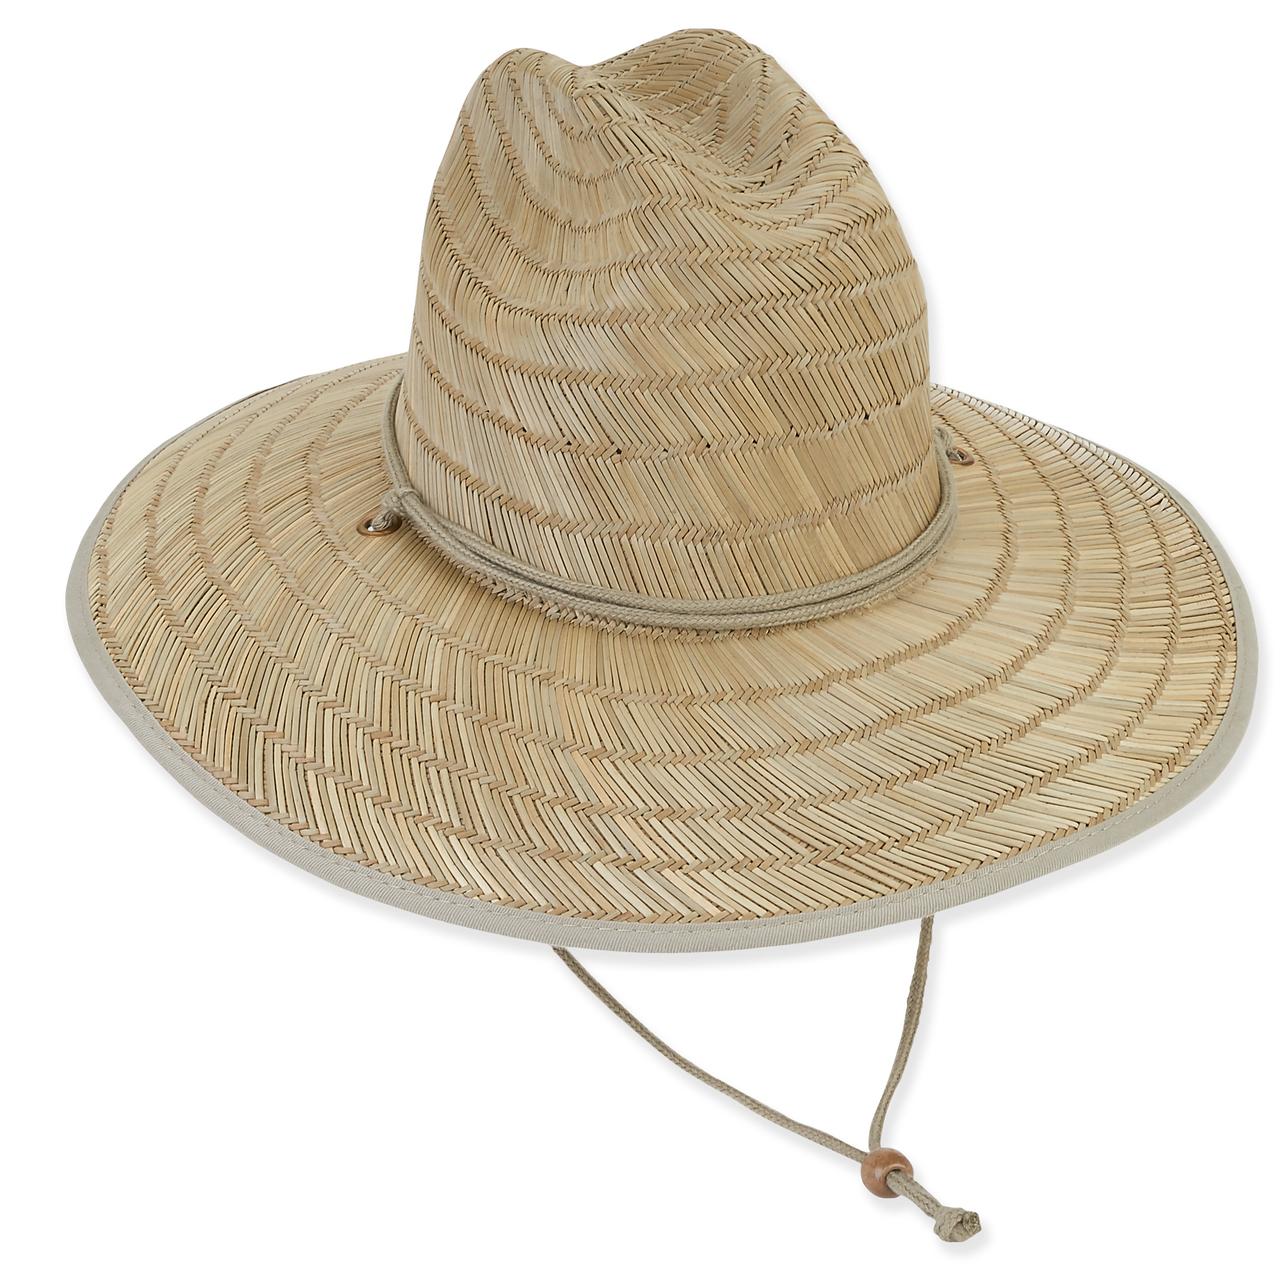 Lifeguard Rush Straw W Cotton Brim Amp Under Brim Chin Cord Sun N Sand Accessories